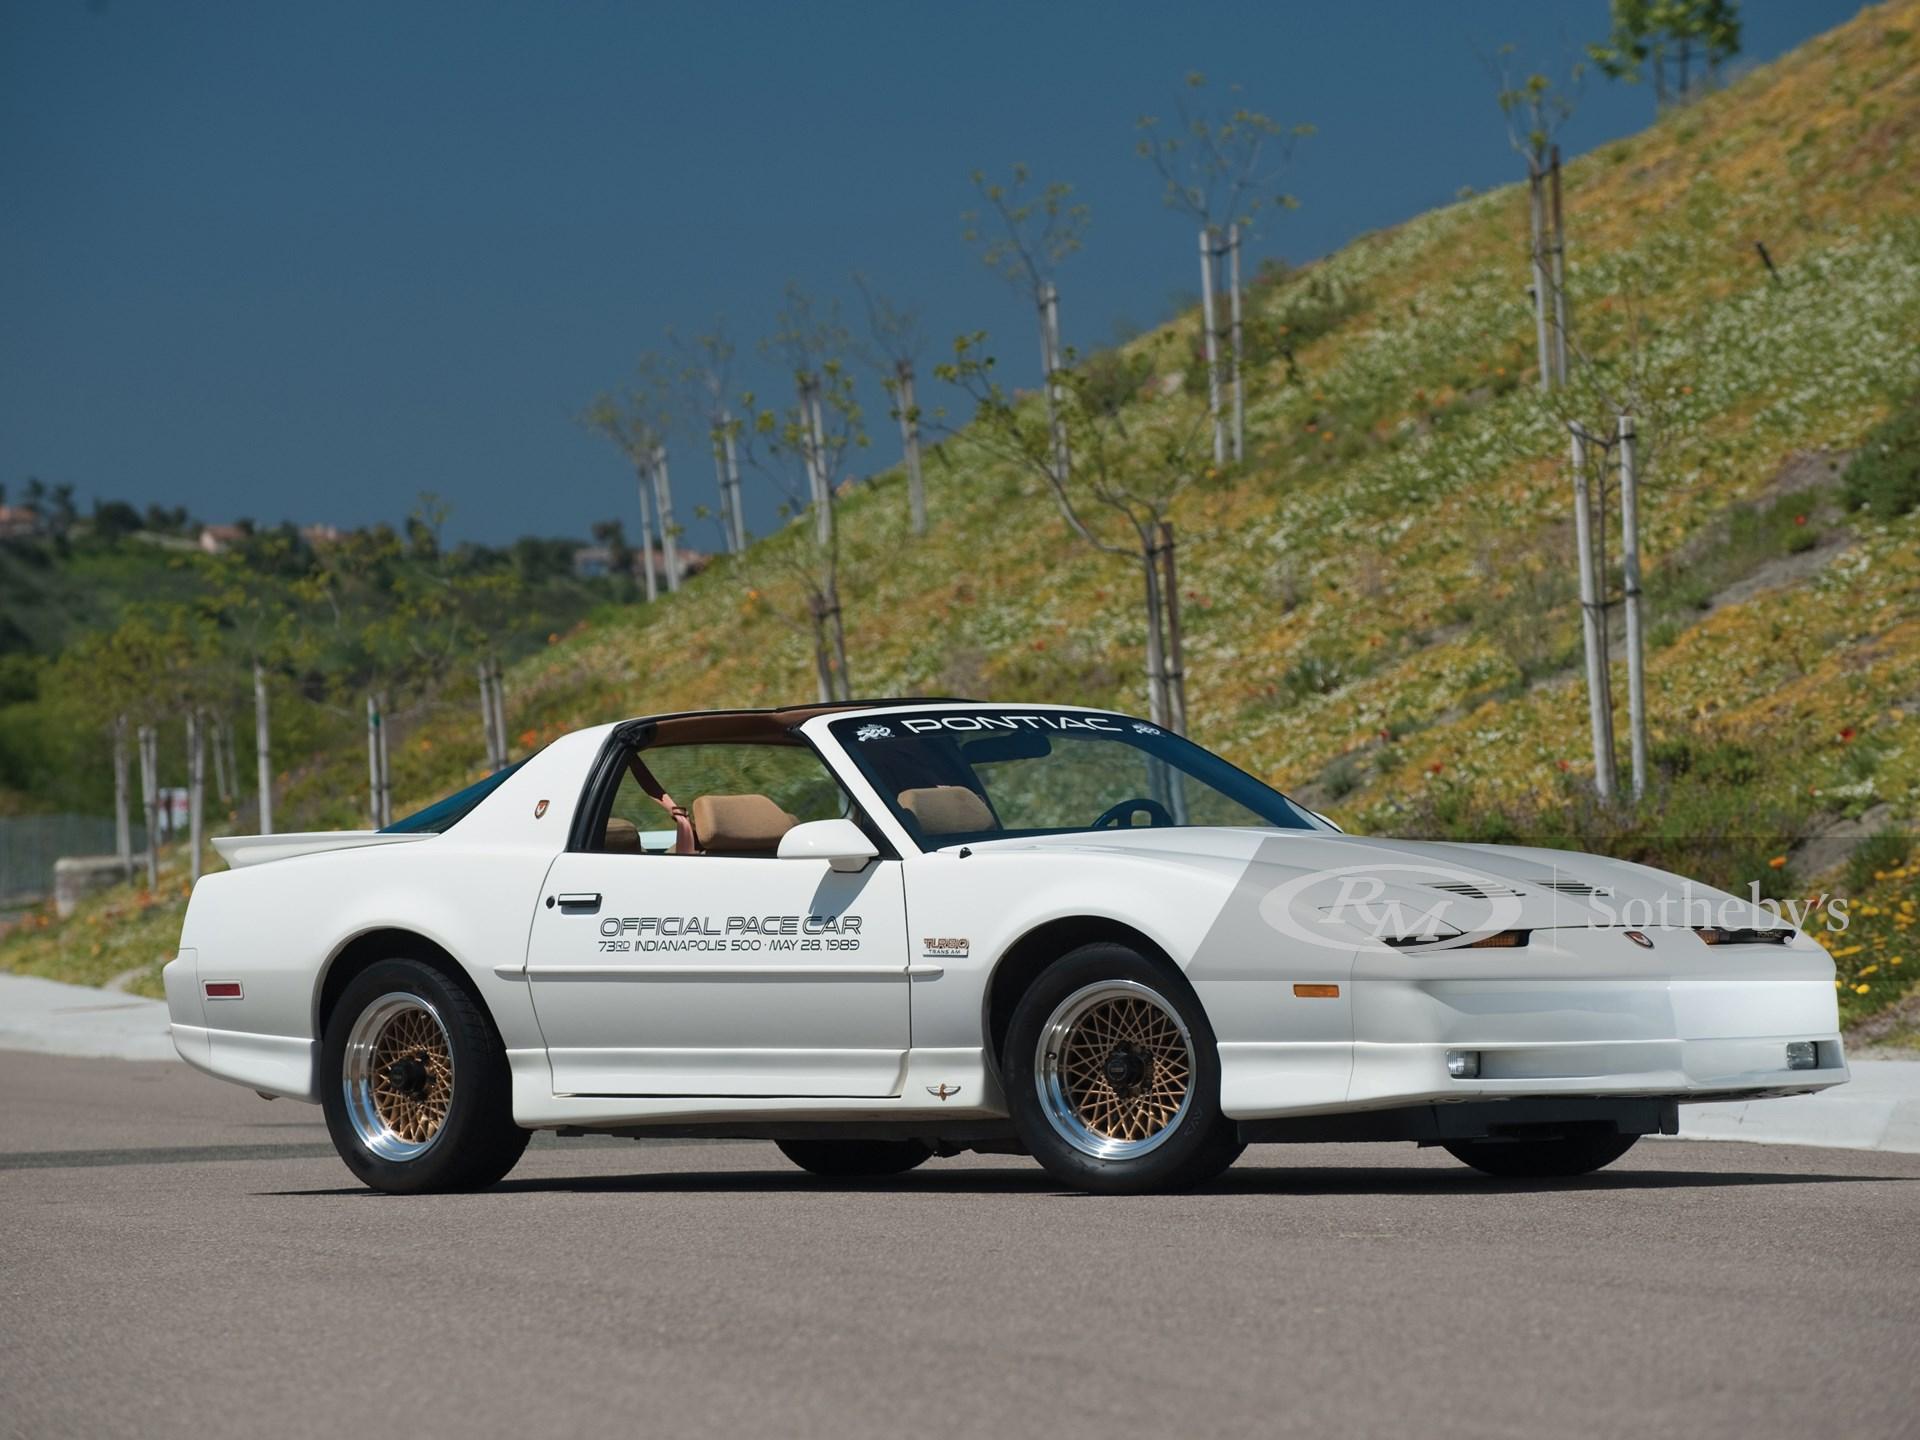 1989 Pontiac Firebird Trans Am 20th Anniversary Special Edition